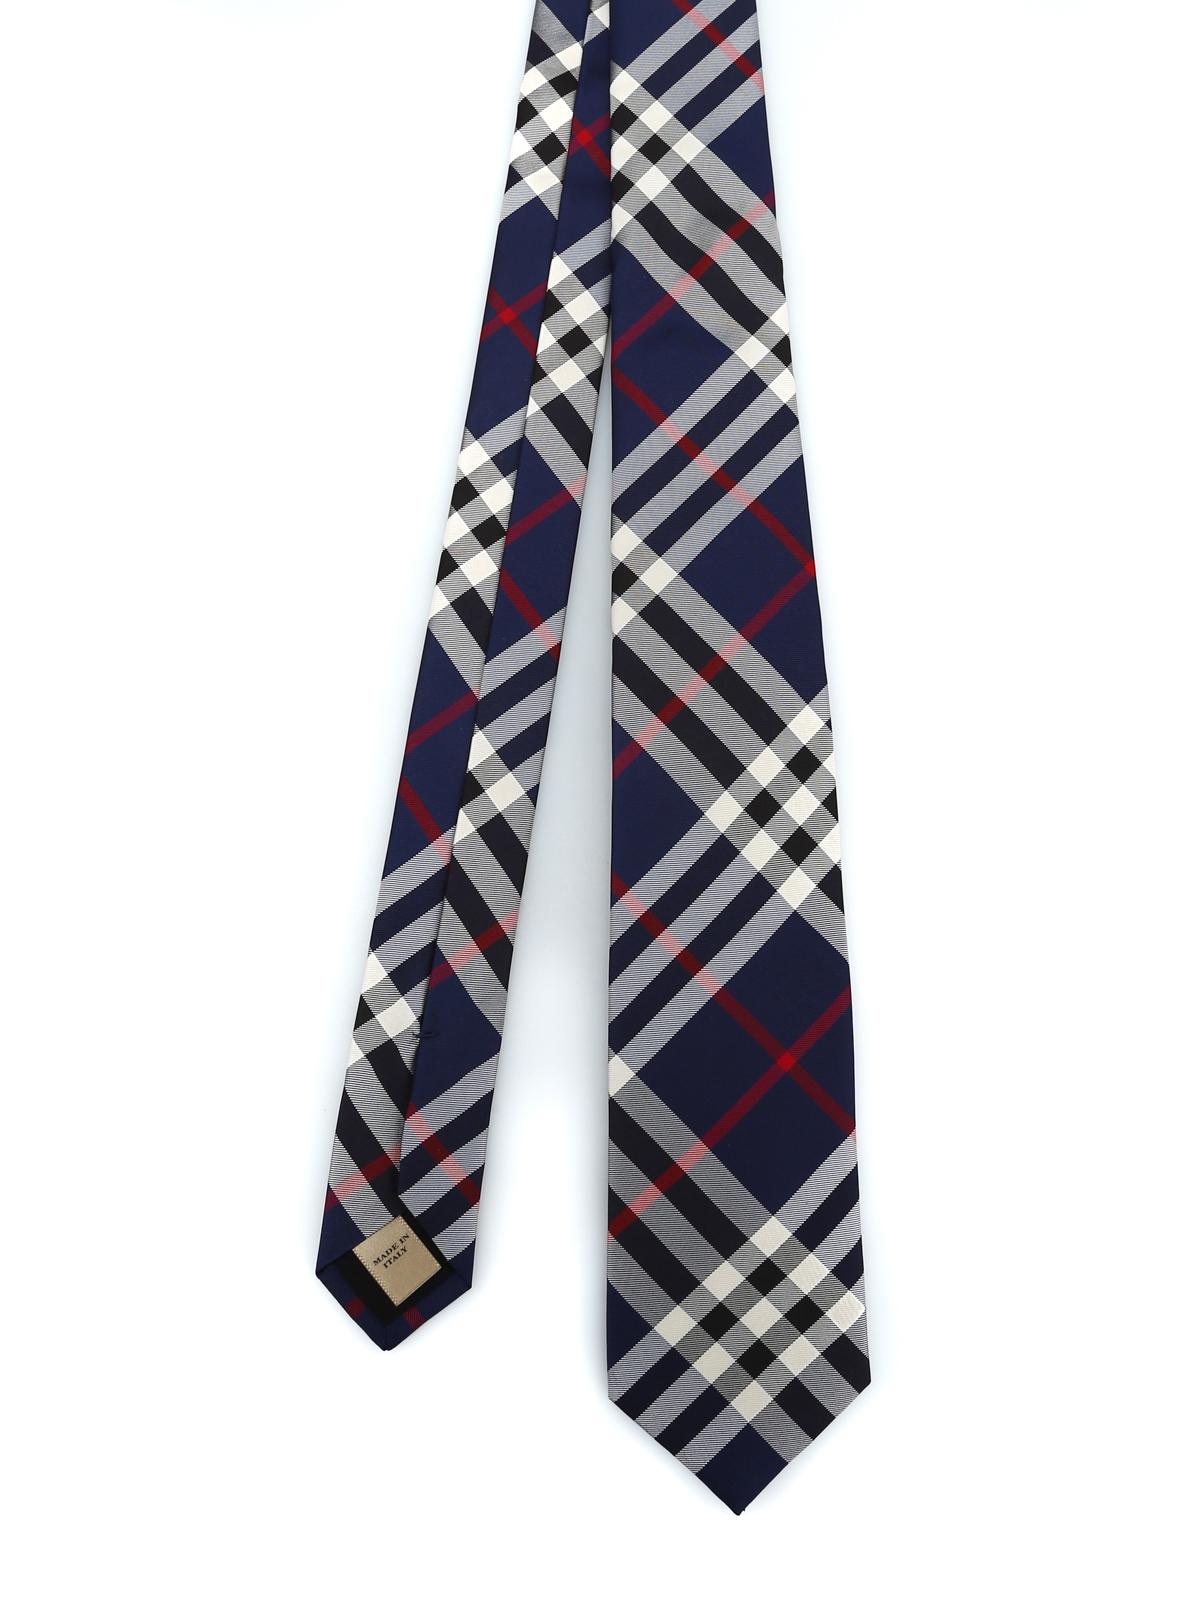 964d3a17560b Burberry - Manston blue Vintage check silk tie - ties & bow ties ...